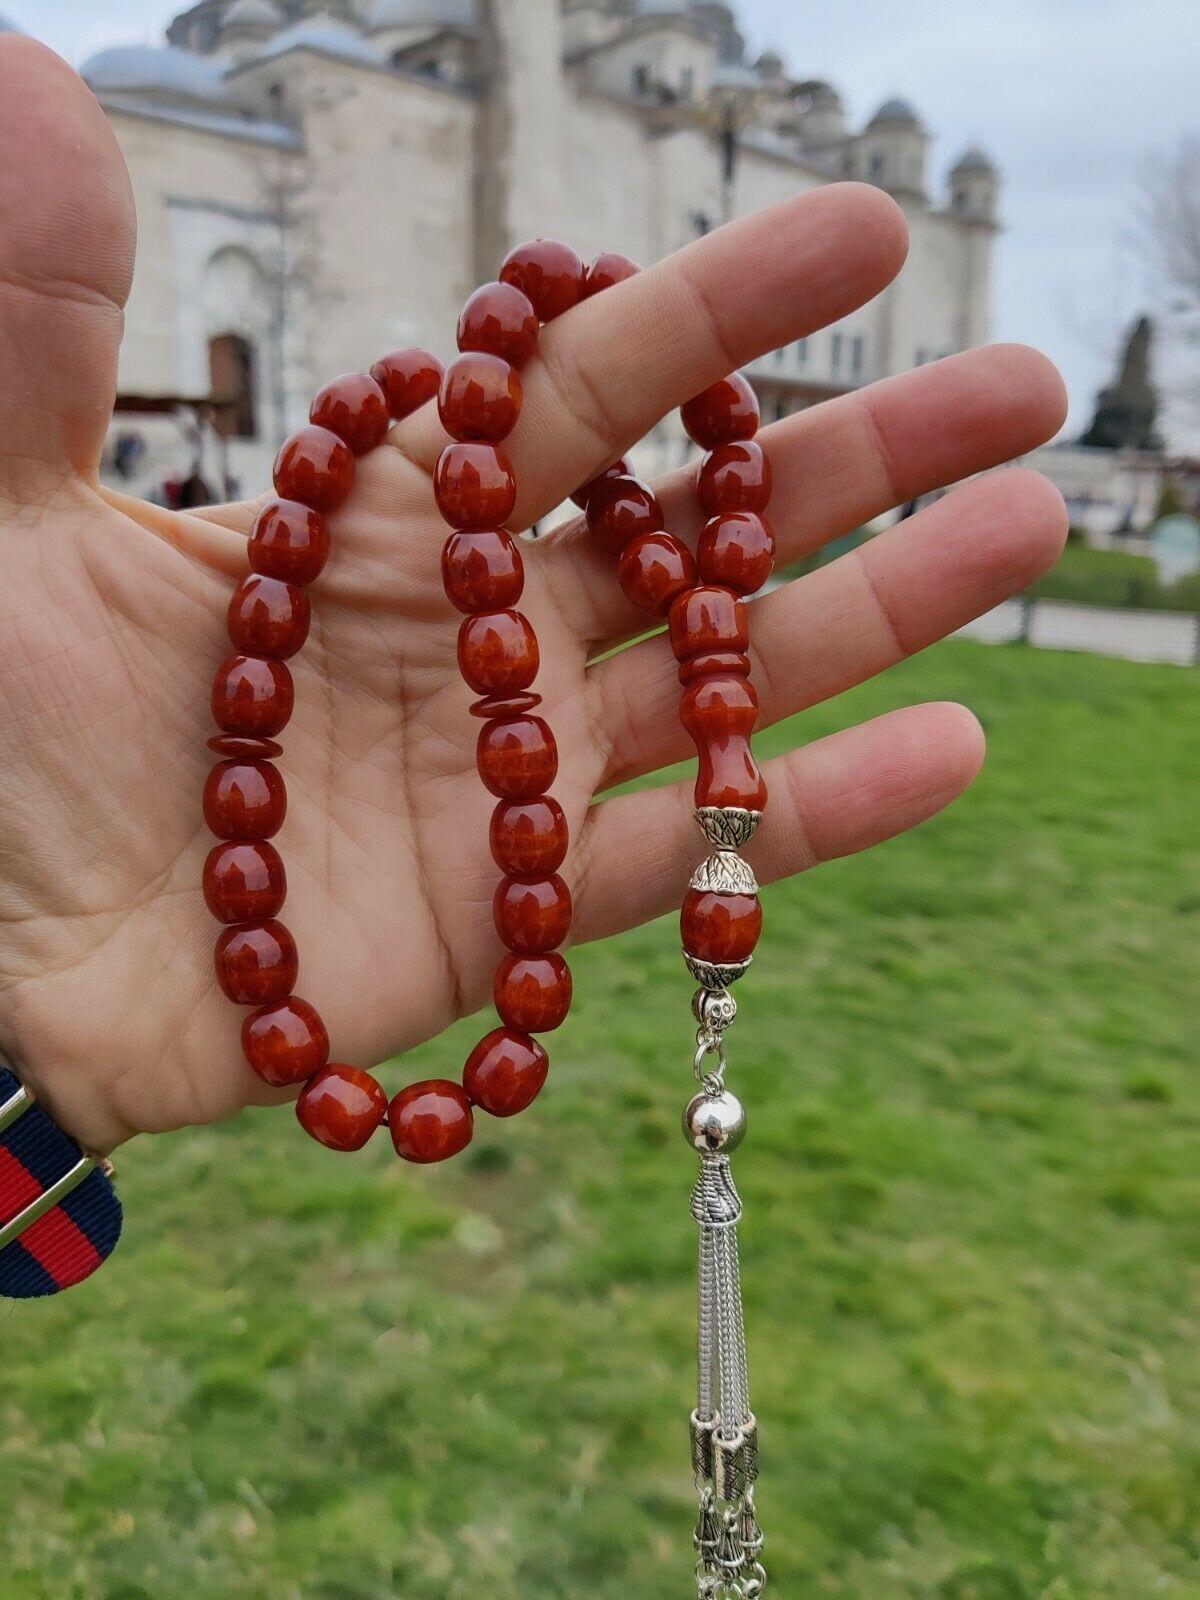 Ottoman Faturan German Amber Sandalous Misbaha Prayer Beads Islamic Gift Tasbih Tasbeeh Tasbeh Rosary Tasbih # 12F